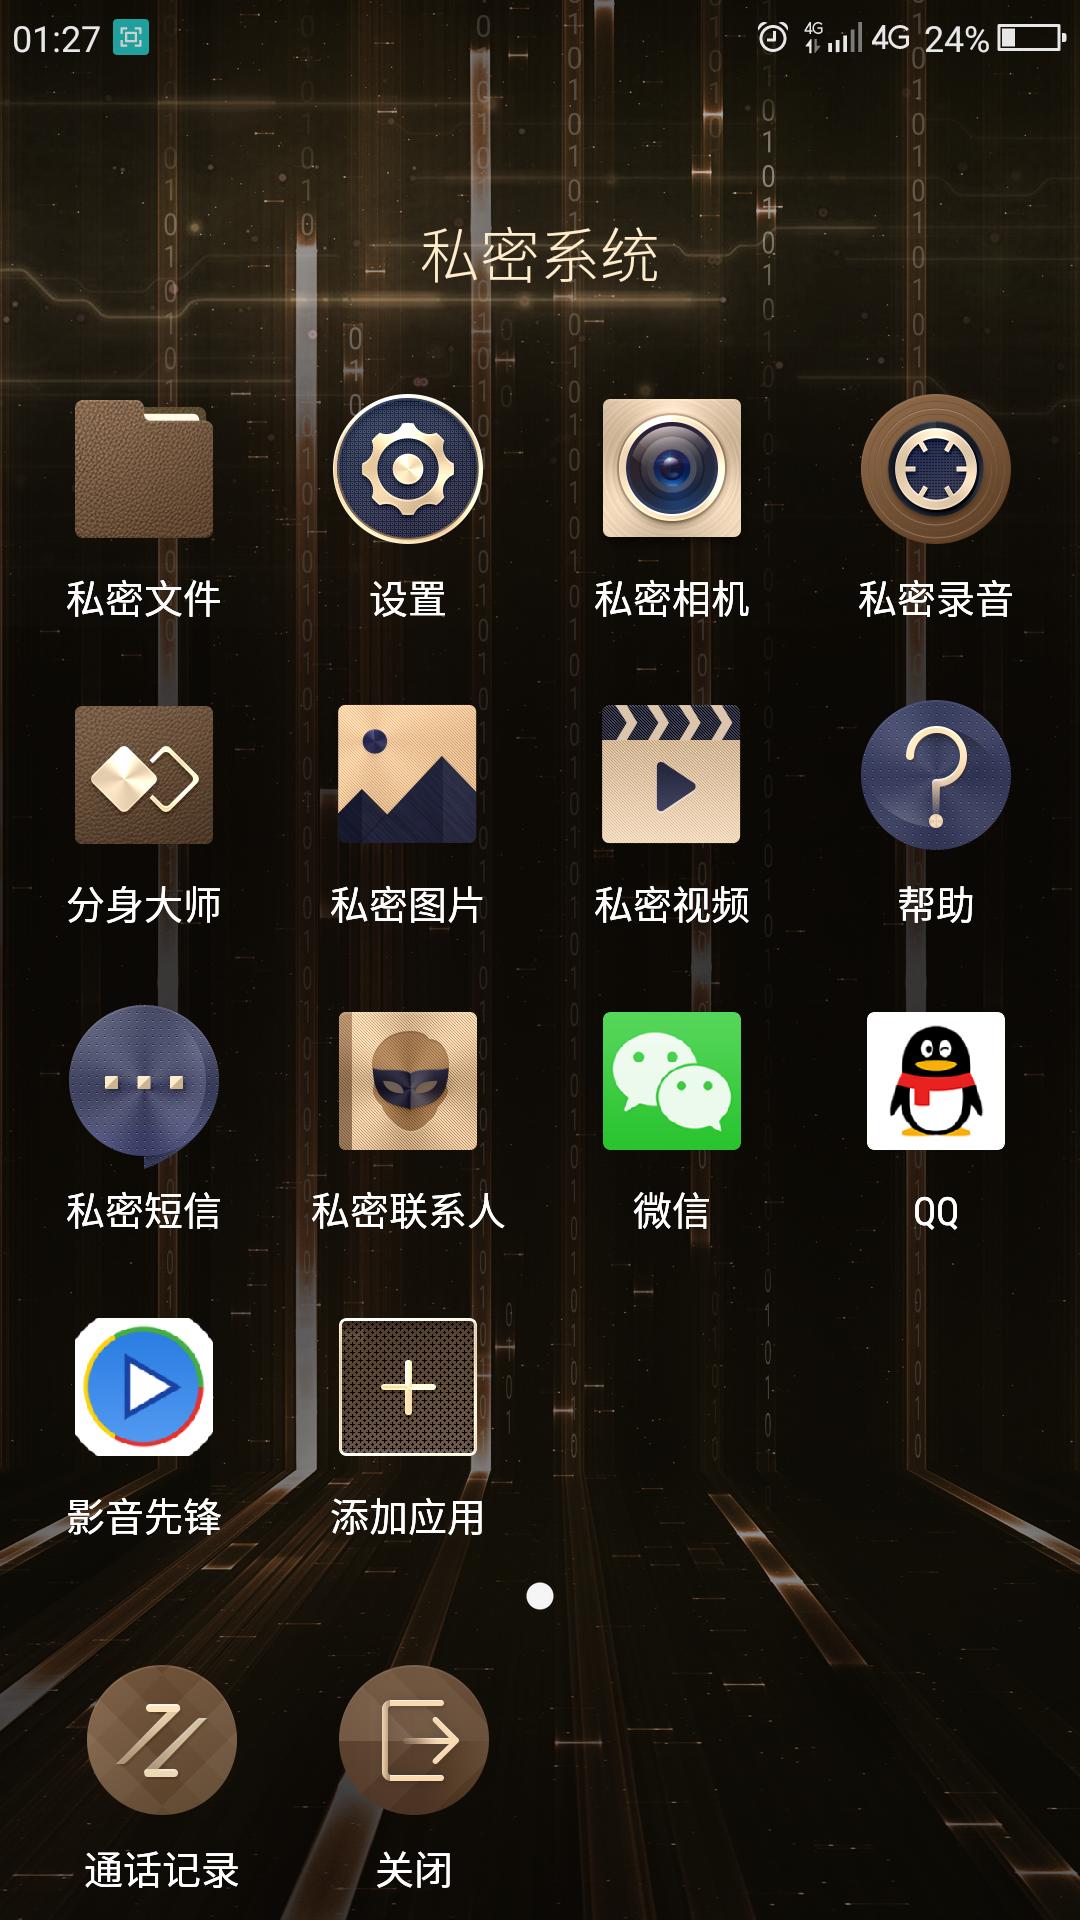 Screenshot_2016-11-03-01-27-15.png